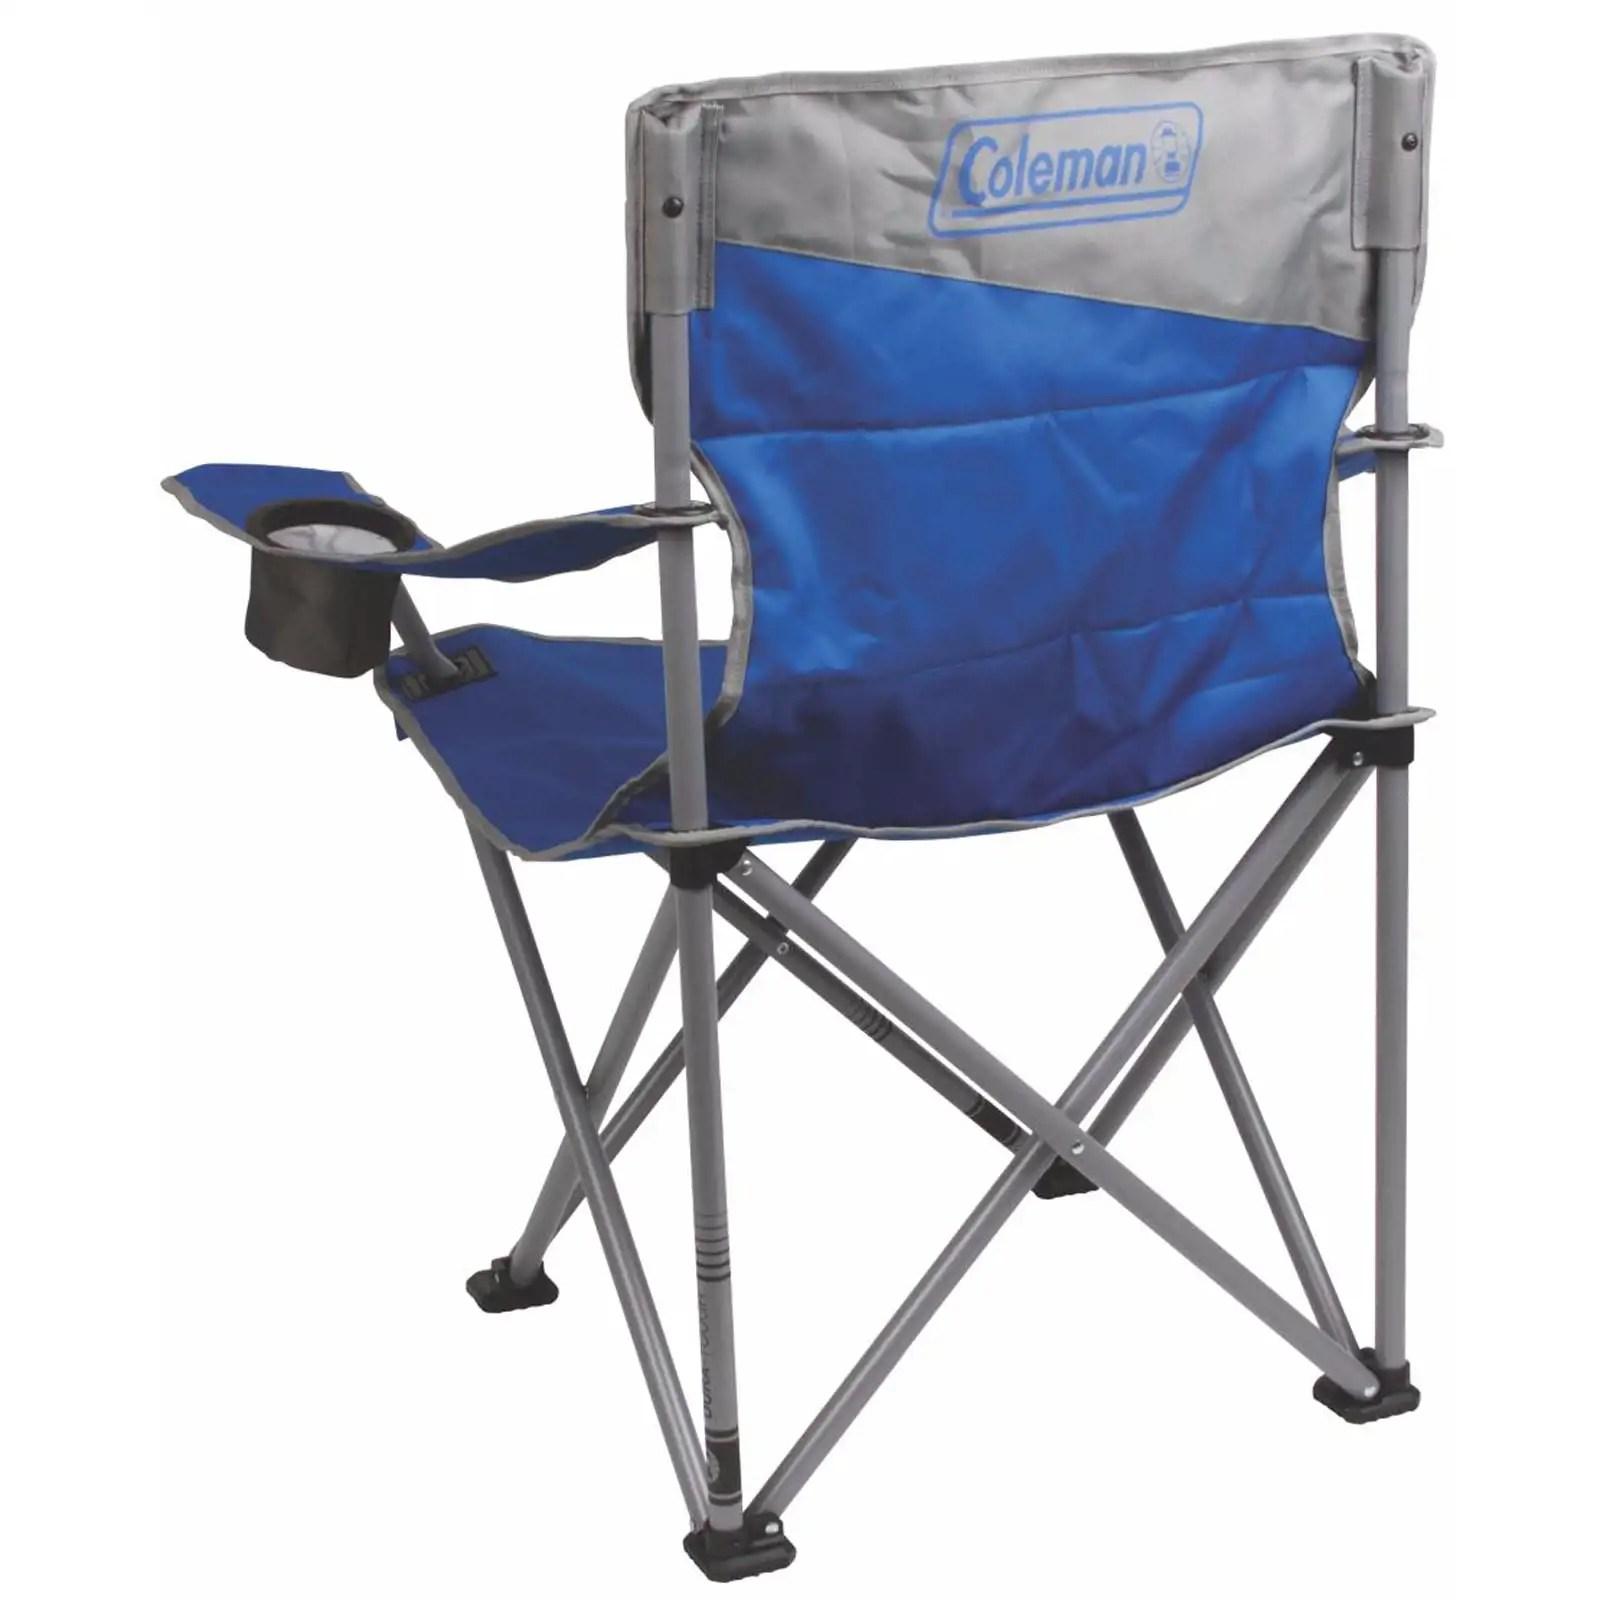 big camping chair large beanbag 2 coleman outdoor beach folding n tall